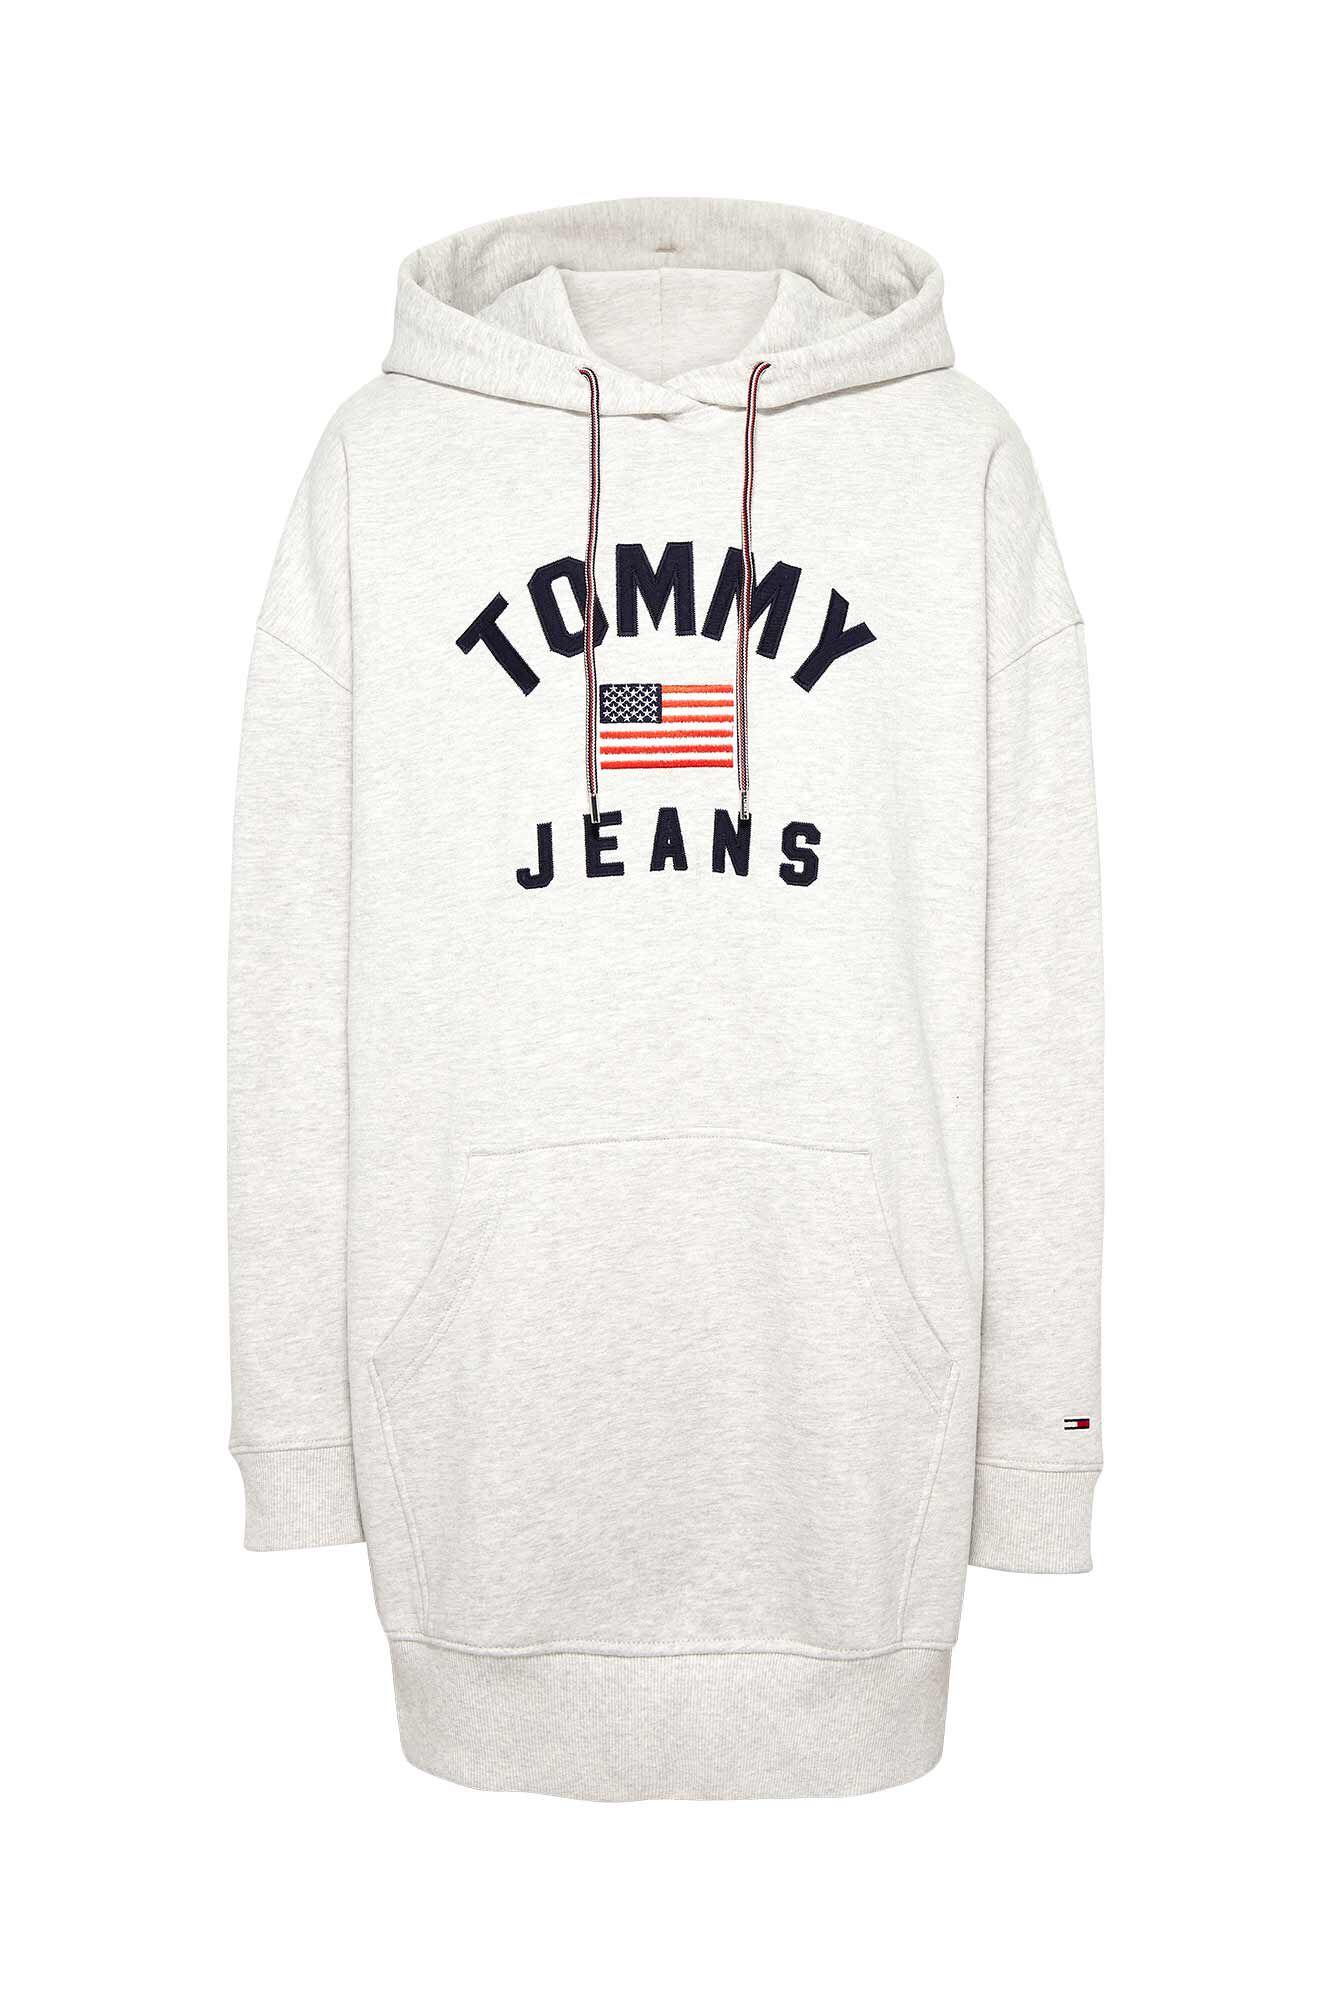 Tjw logo hoodie dress DW0DW072, PPP